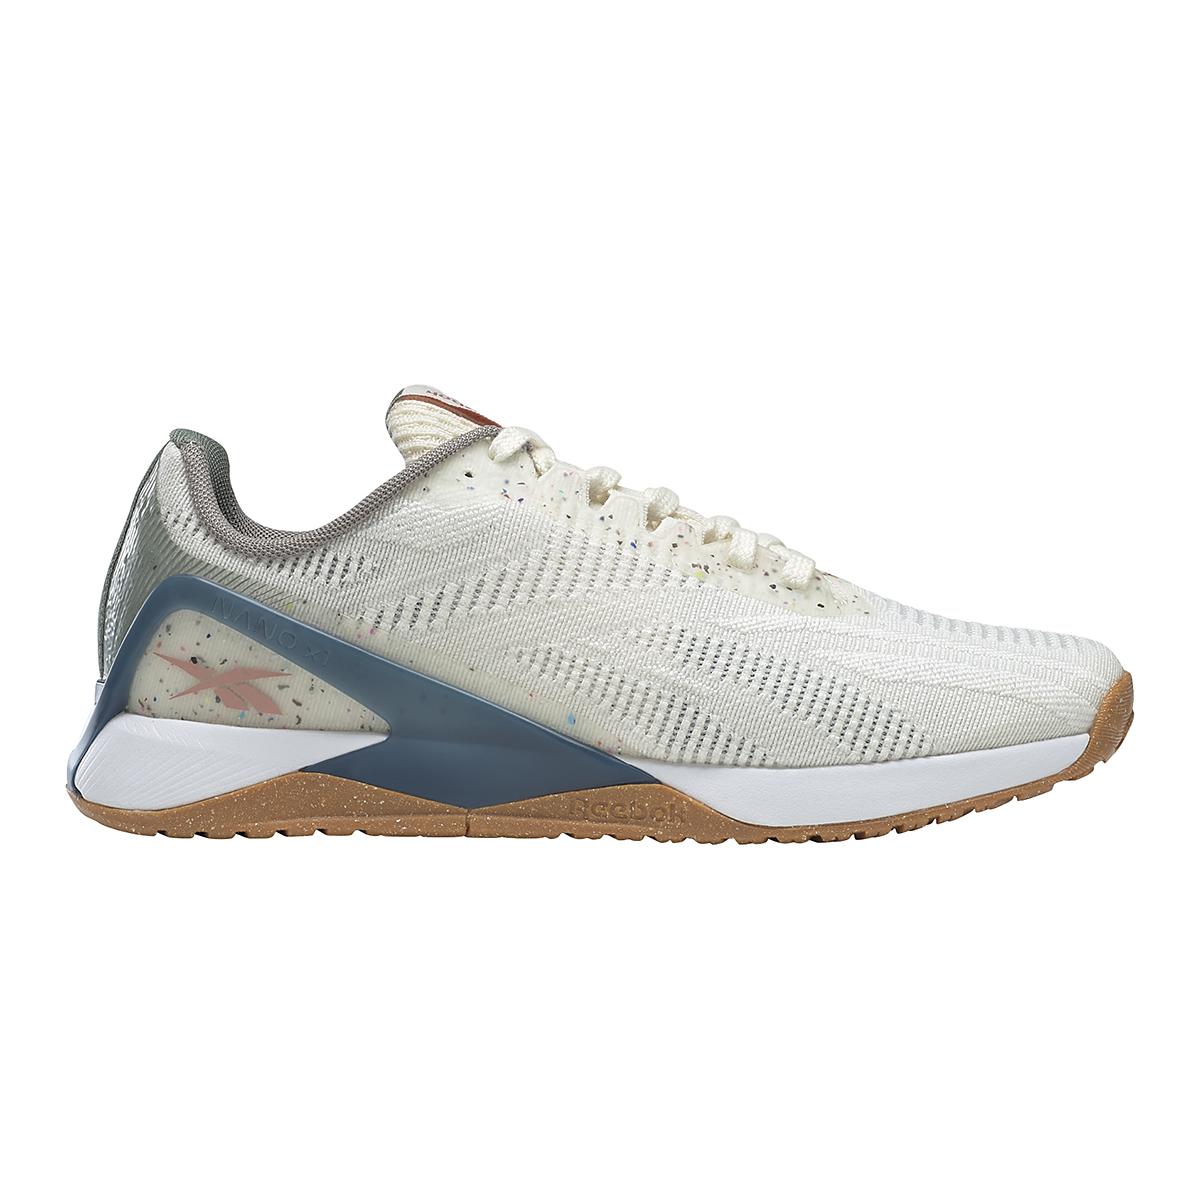 Women's Reebok Nano X1 Vegan Training Shoe - Color: Classic White/Harmony Green/Brave Blue - Size: 5 - Width: Regular, Classic White/Harmony Green/Brave Blue, large, image 1